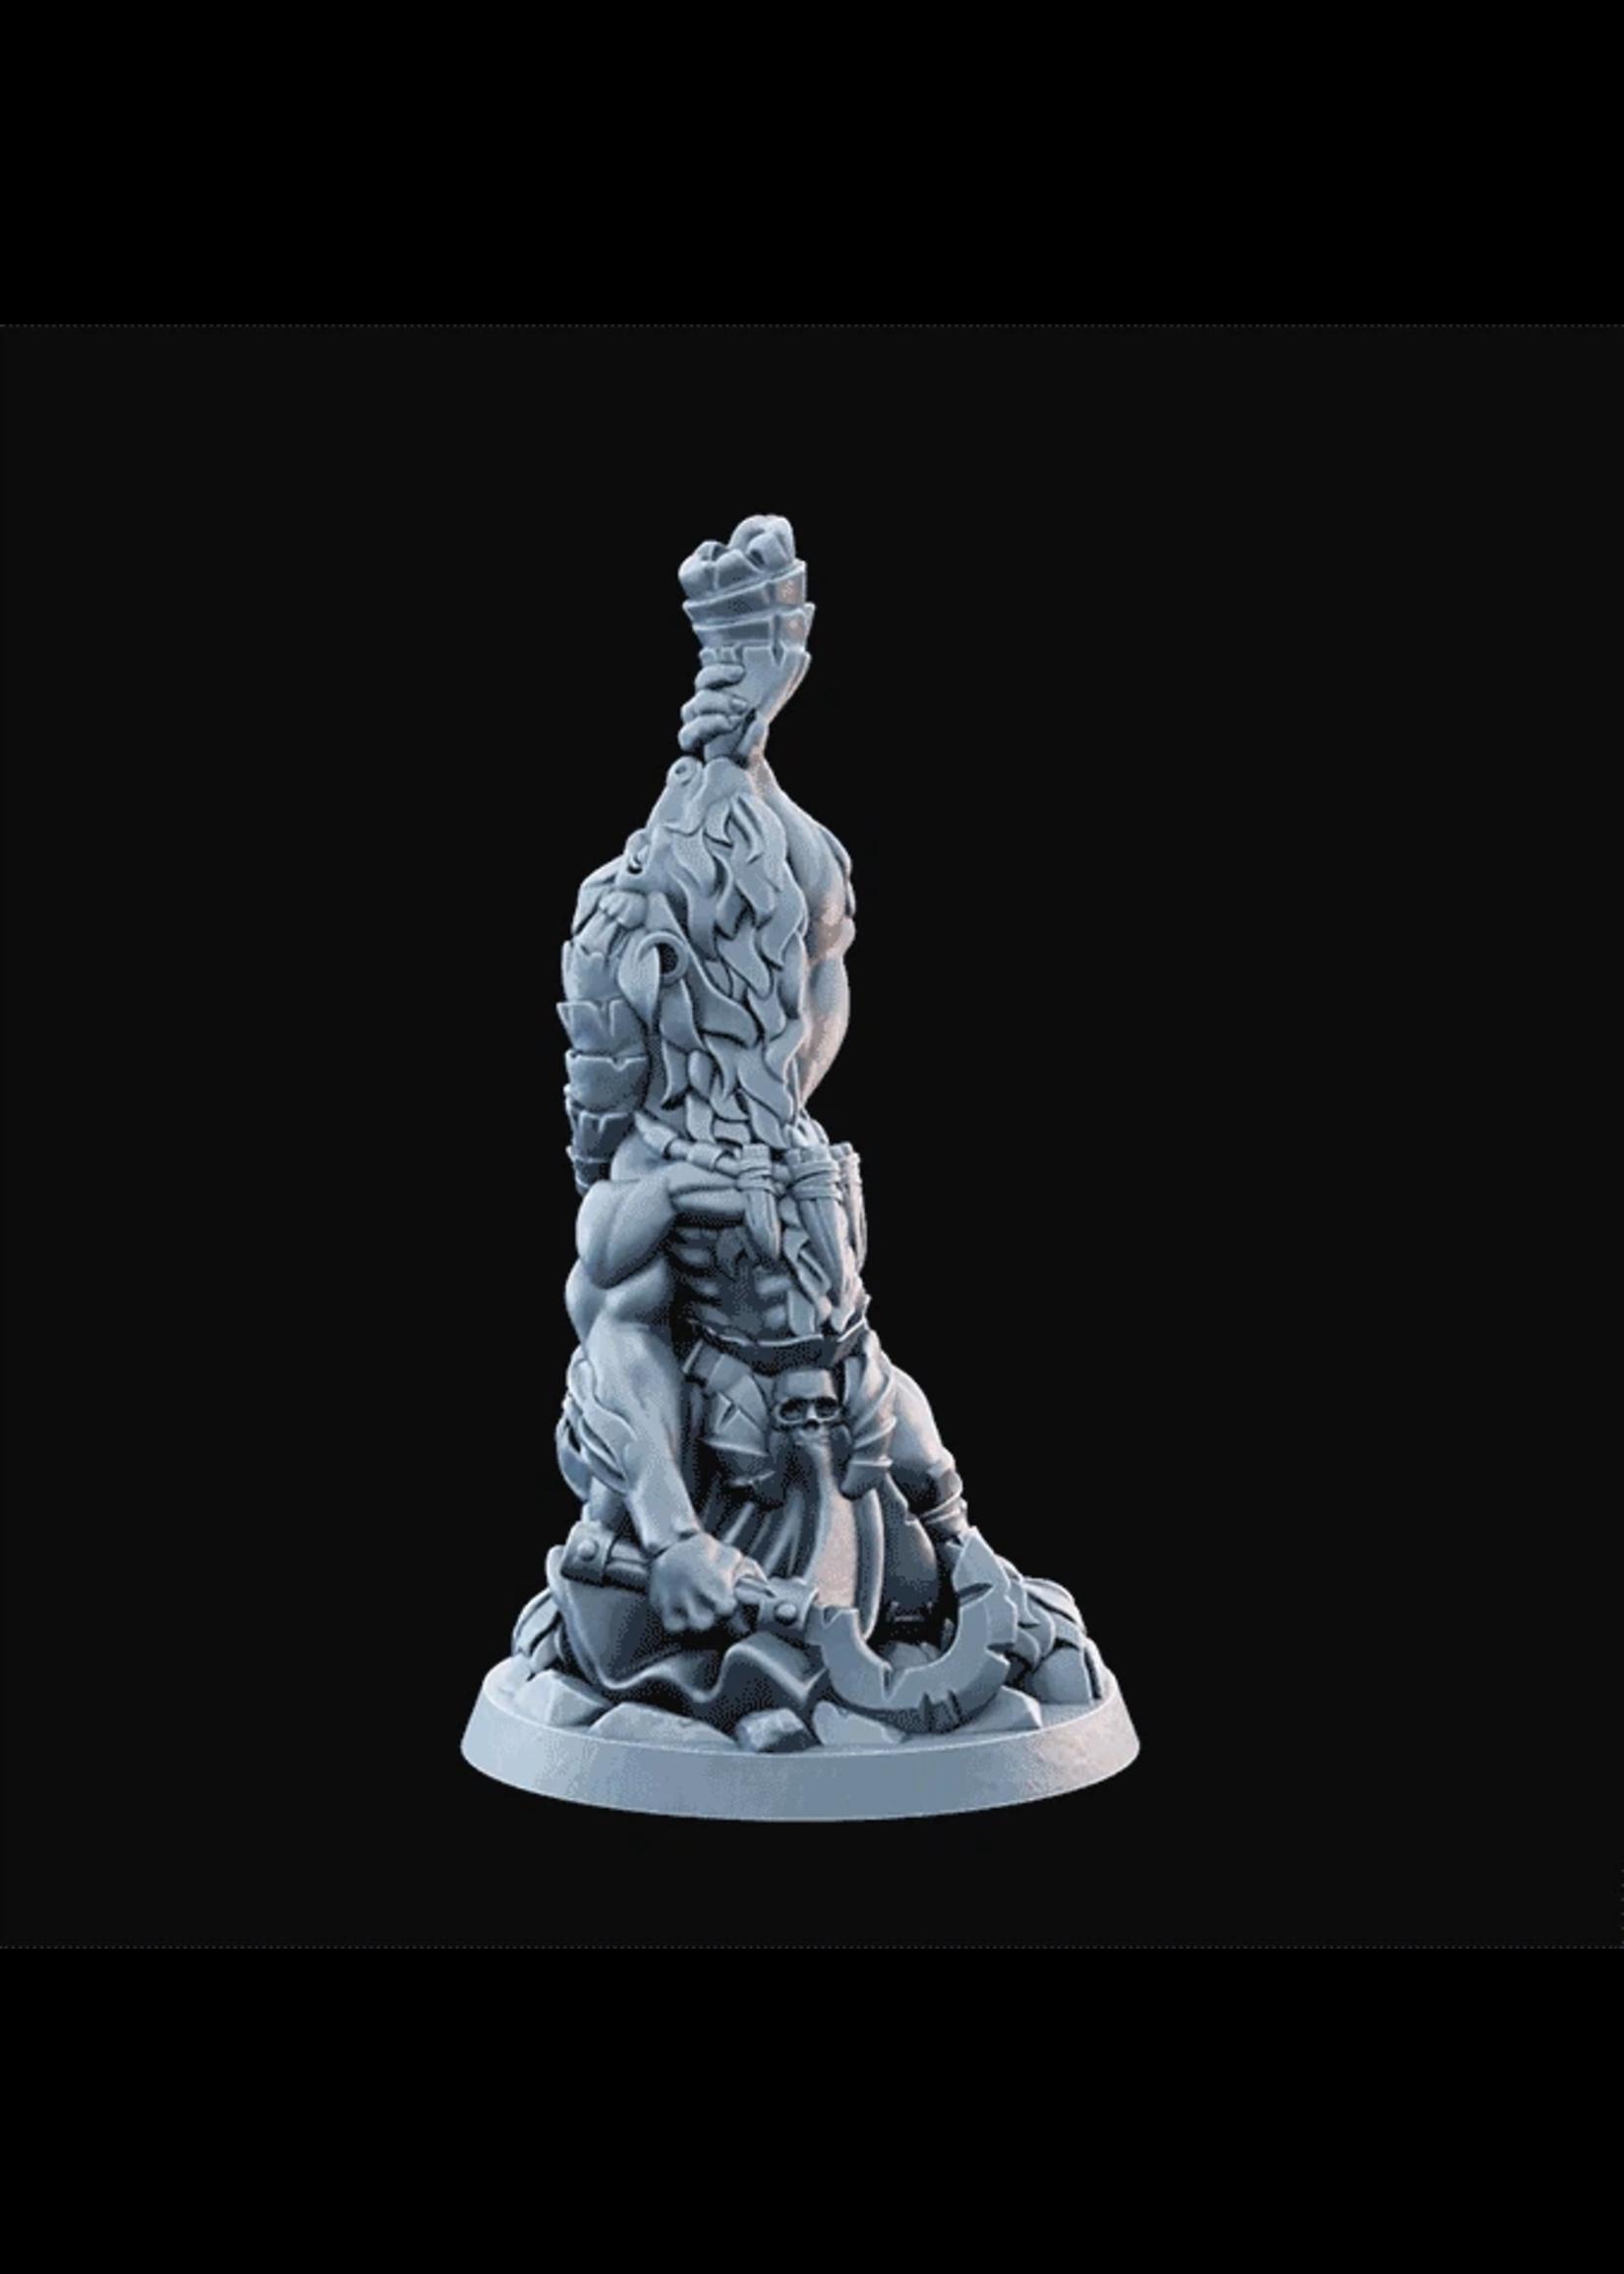 3D Printed Miniature - Goatman03  - Dungeons & Dragons - Desolate Plains KS